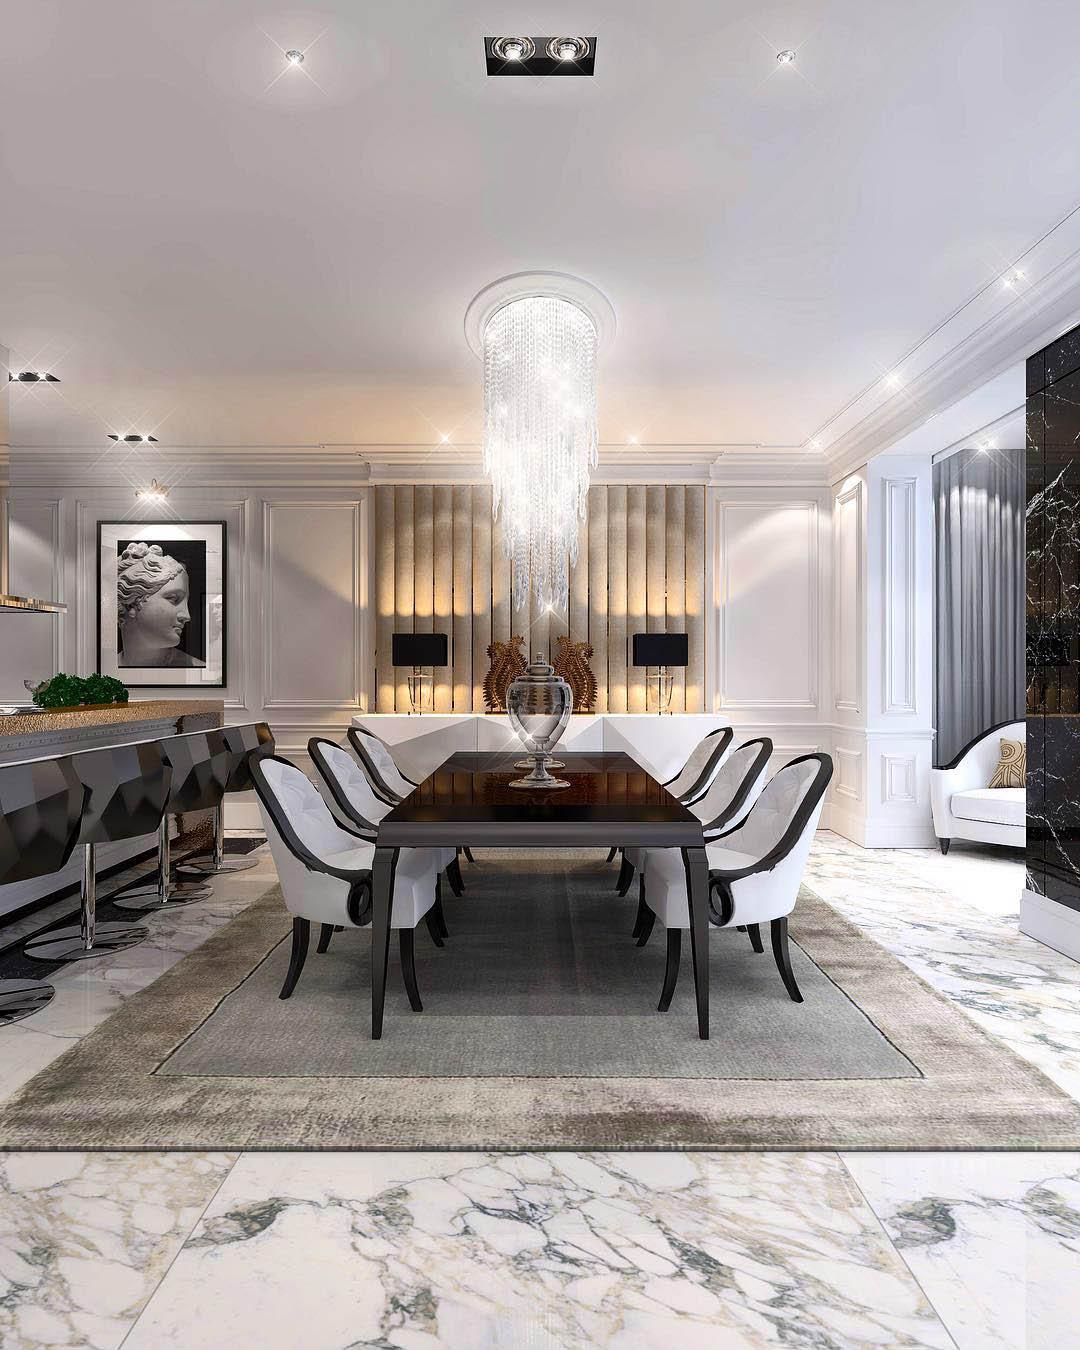 Glamorous Dining Room Ideas   Constantin Frolov Interior Design